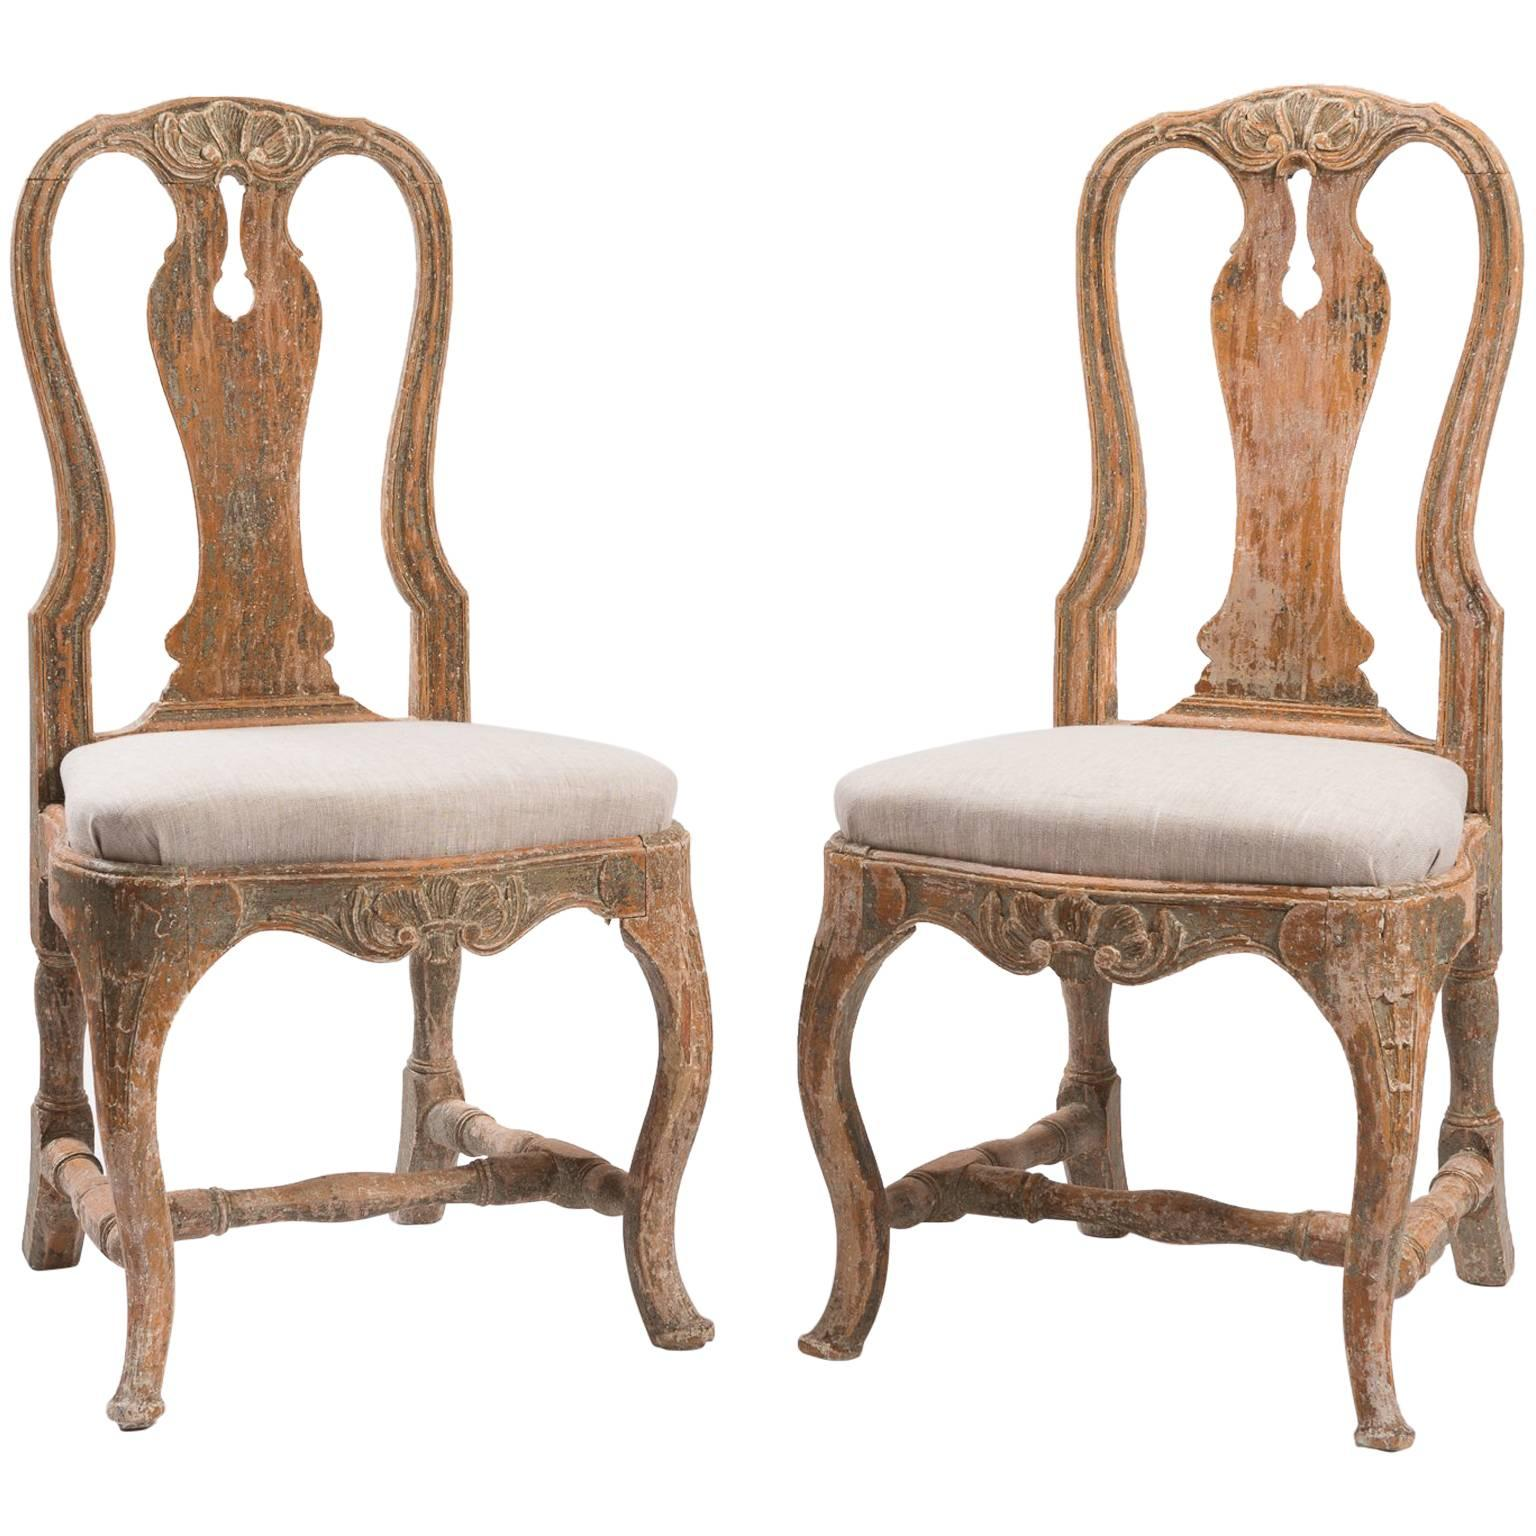 18th Century Swedish Rococo Chairs